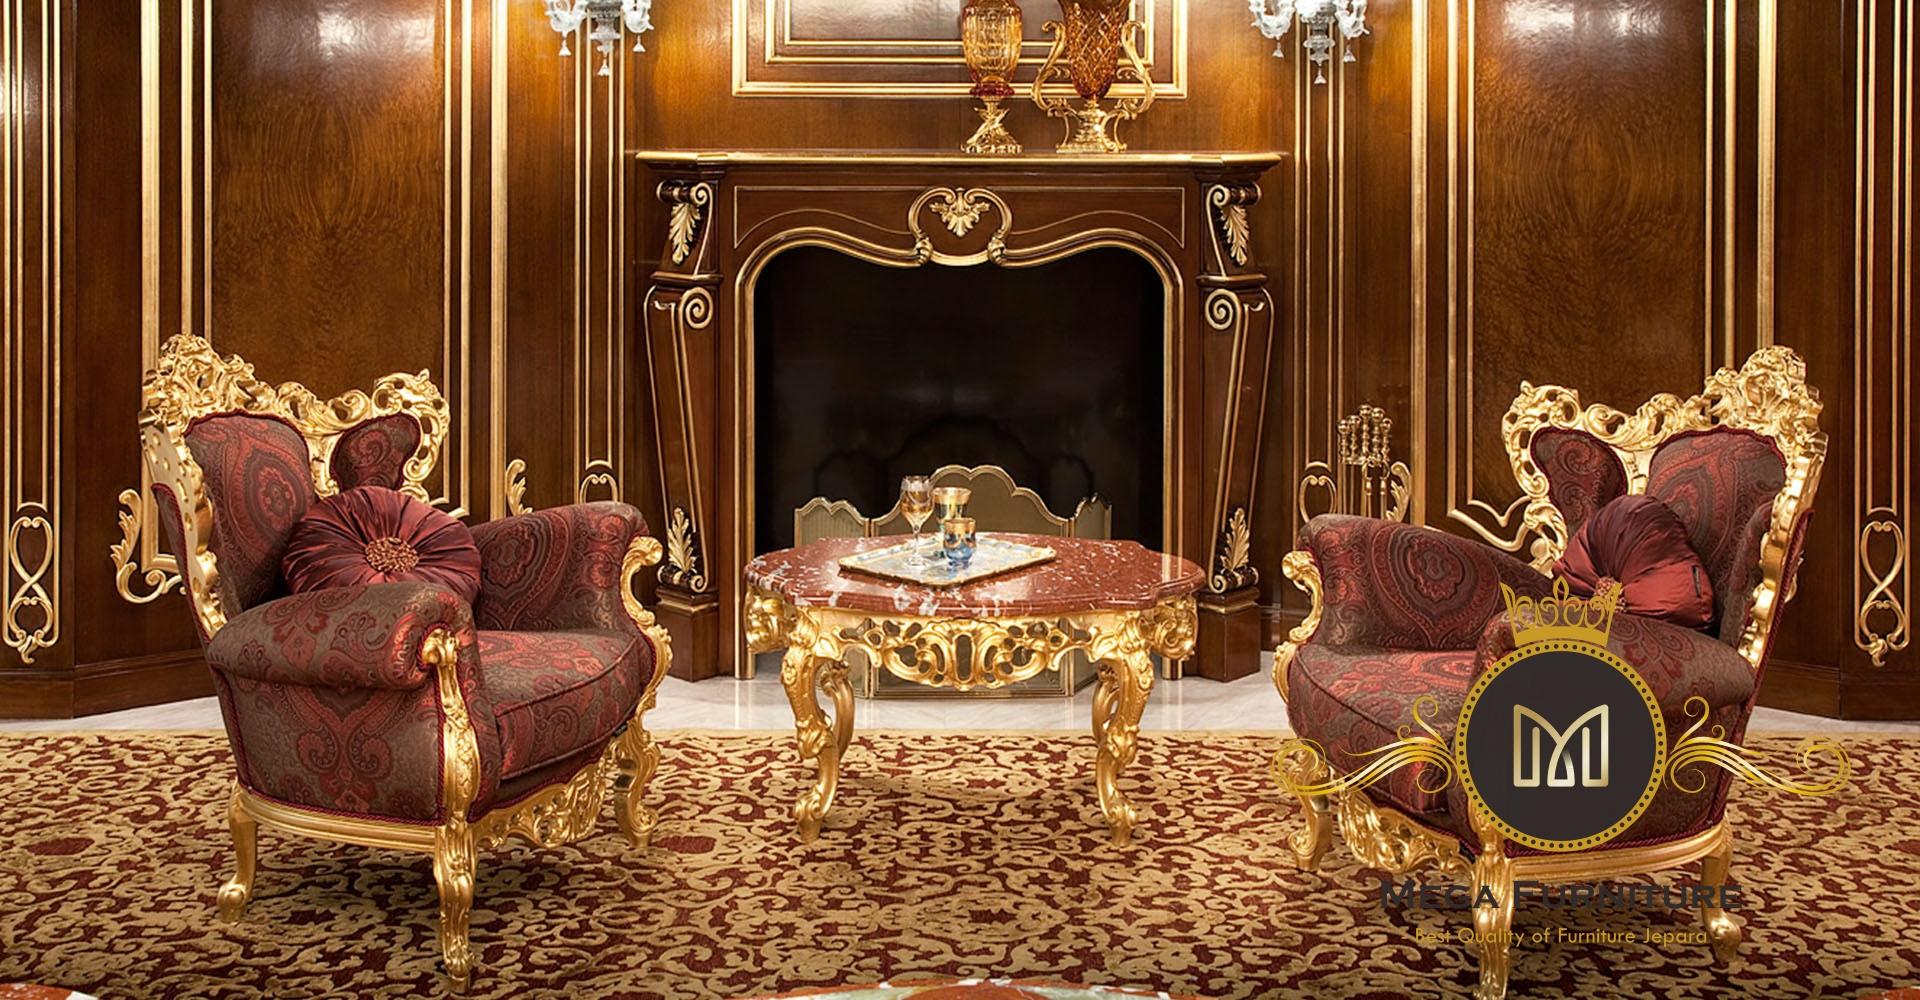 Sofa Tamu Mewah Fabrics, Victorian Fabric Living Room, Italian Furniture Living Room, French Provincial Living Room Furniture, Sofa Tamu Ukir Mewah Jati Jepara, Sofa tamu ukiran jati, sof atmu ukiran jepara, sofa tamu minimalis, sofa tamu mewah, sofa tamu murah, sofa tamu modern, sofa minimalis modern, ruang tamu minimalis, kursi tamu sofa murah, kursi tamu sofa mewah, harga kursi tamu sofa, kursi tamu sofa minimalis, kursi tamu sofa minimlais modern, sofa ruang tamu mewah, kursi tamu minimalis modern, Mega Furniture